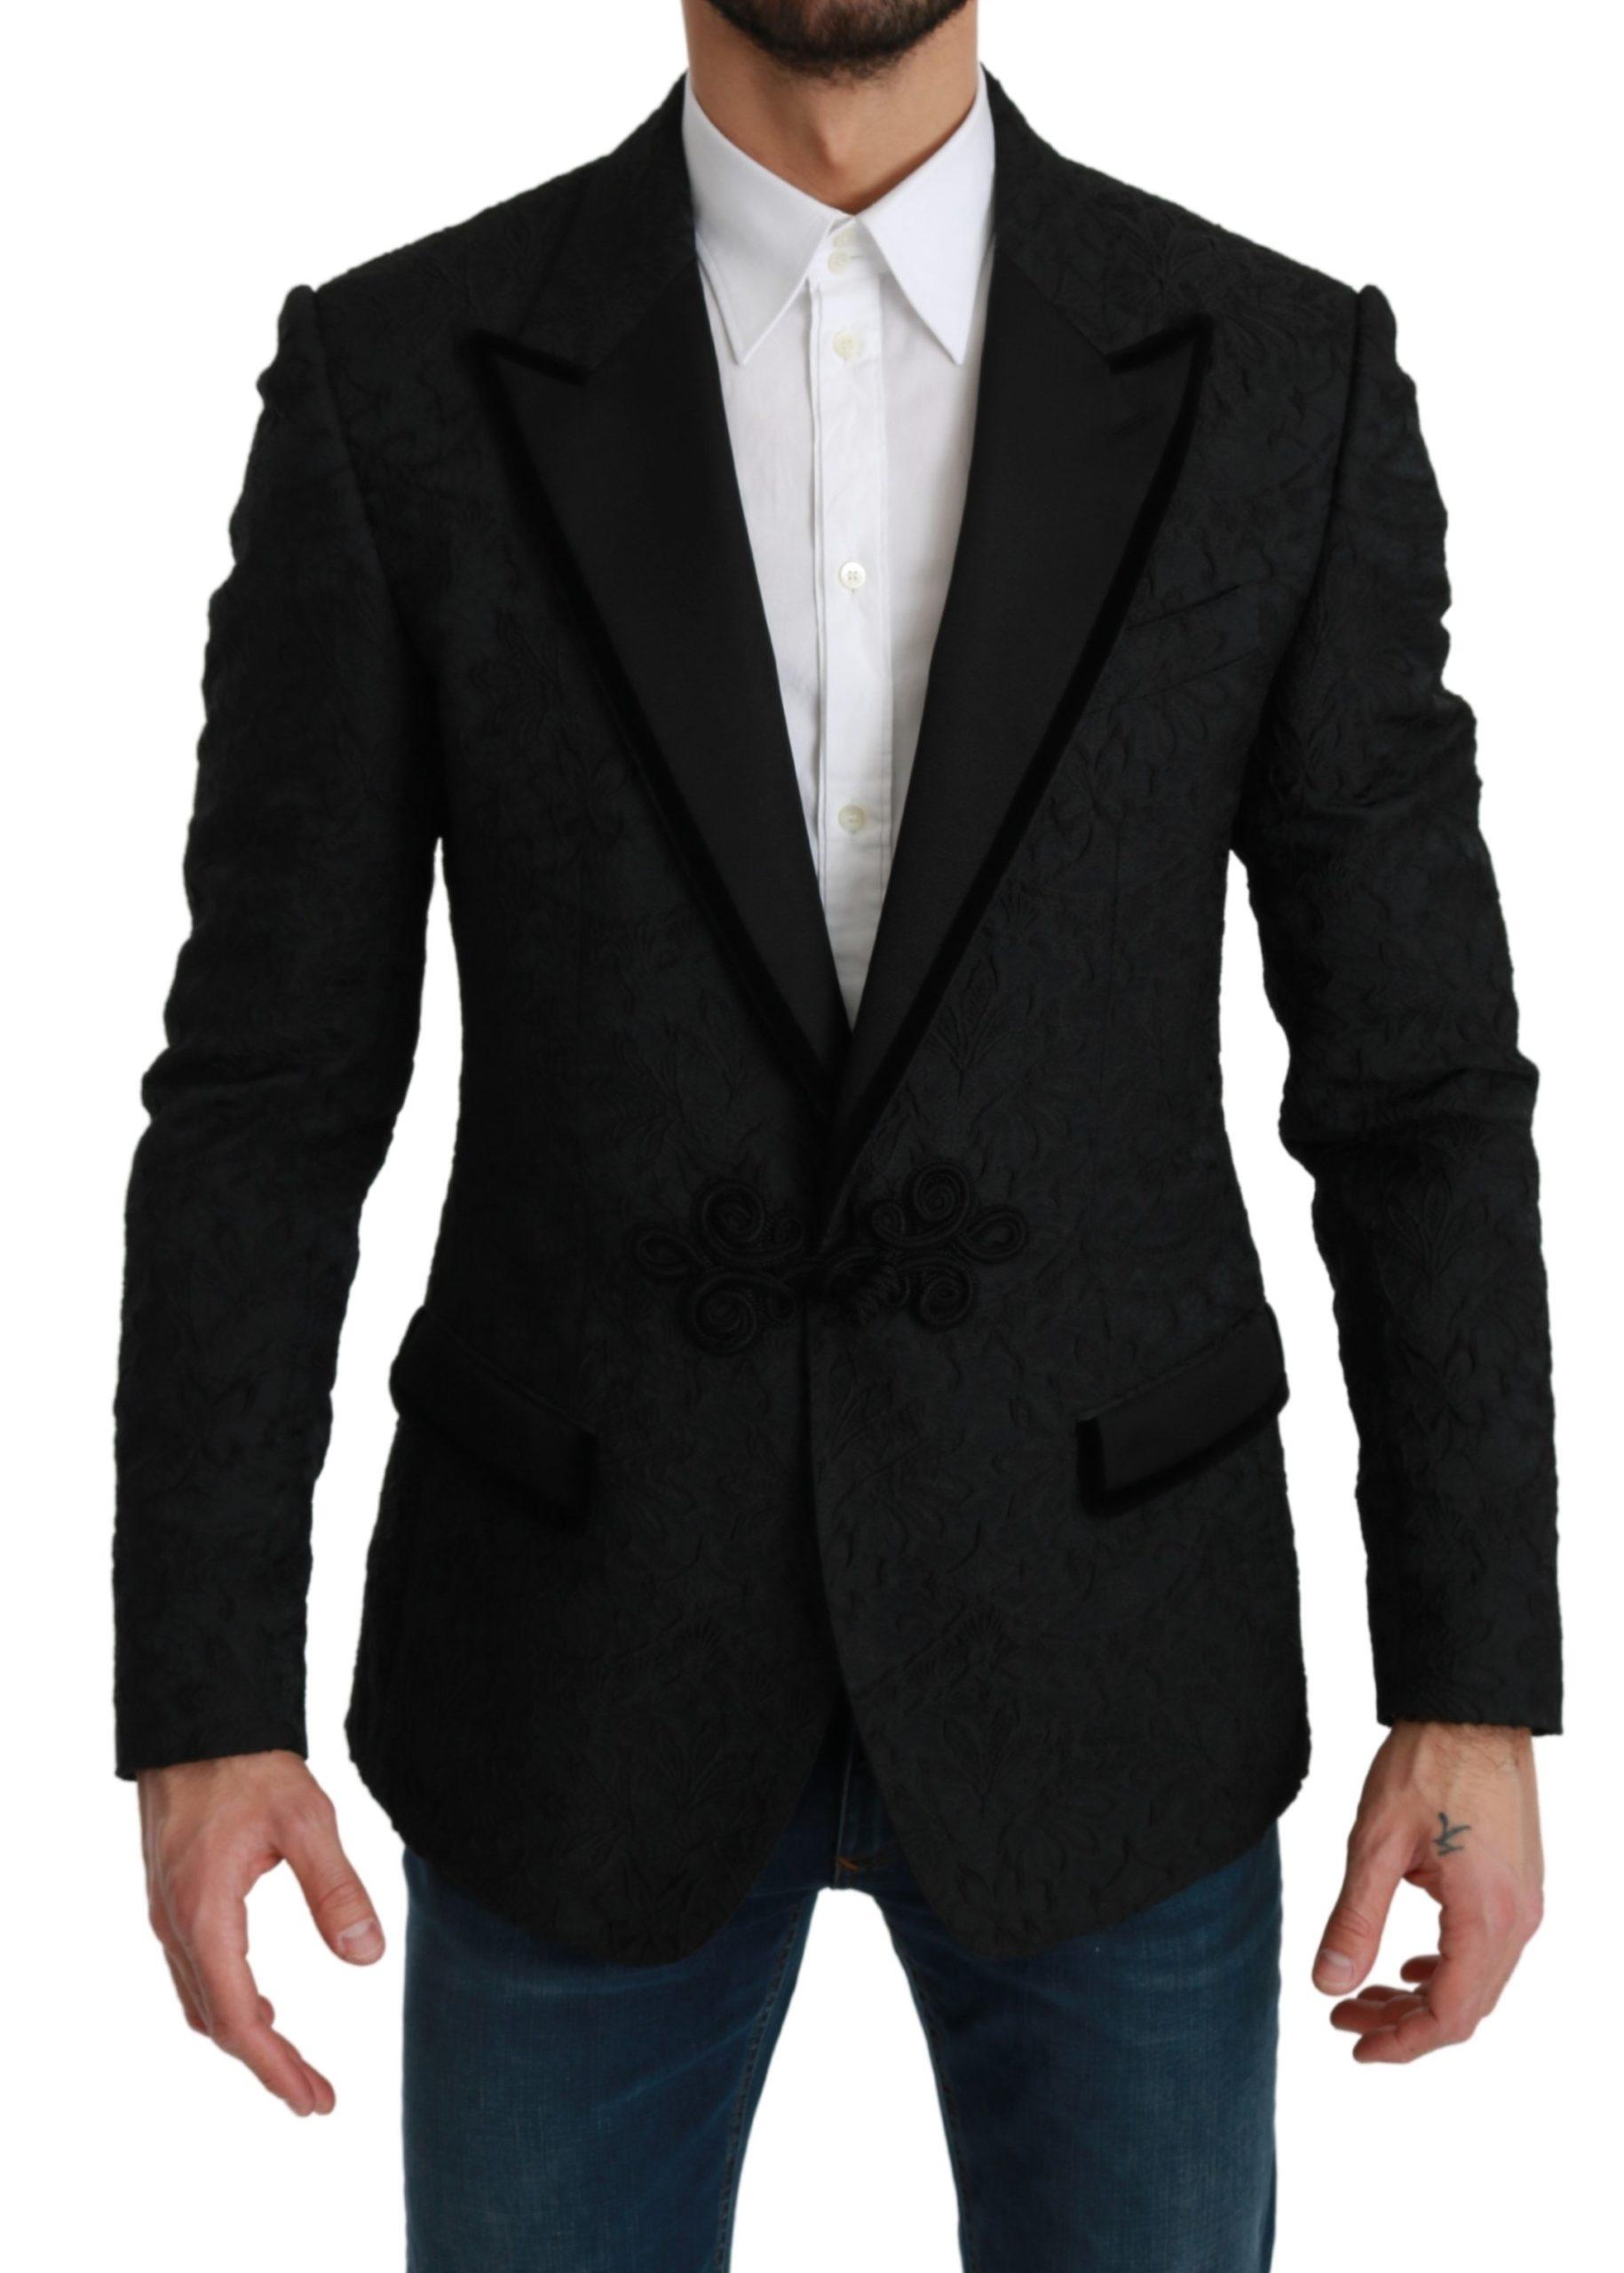 Dolce & Gabbana Men's Torero Slim Fit Blazer Black KOS1779 - IT54 | XL